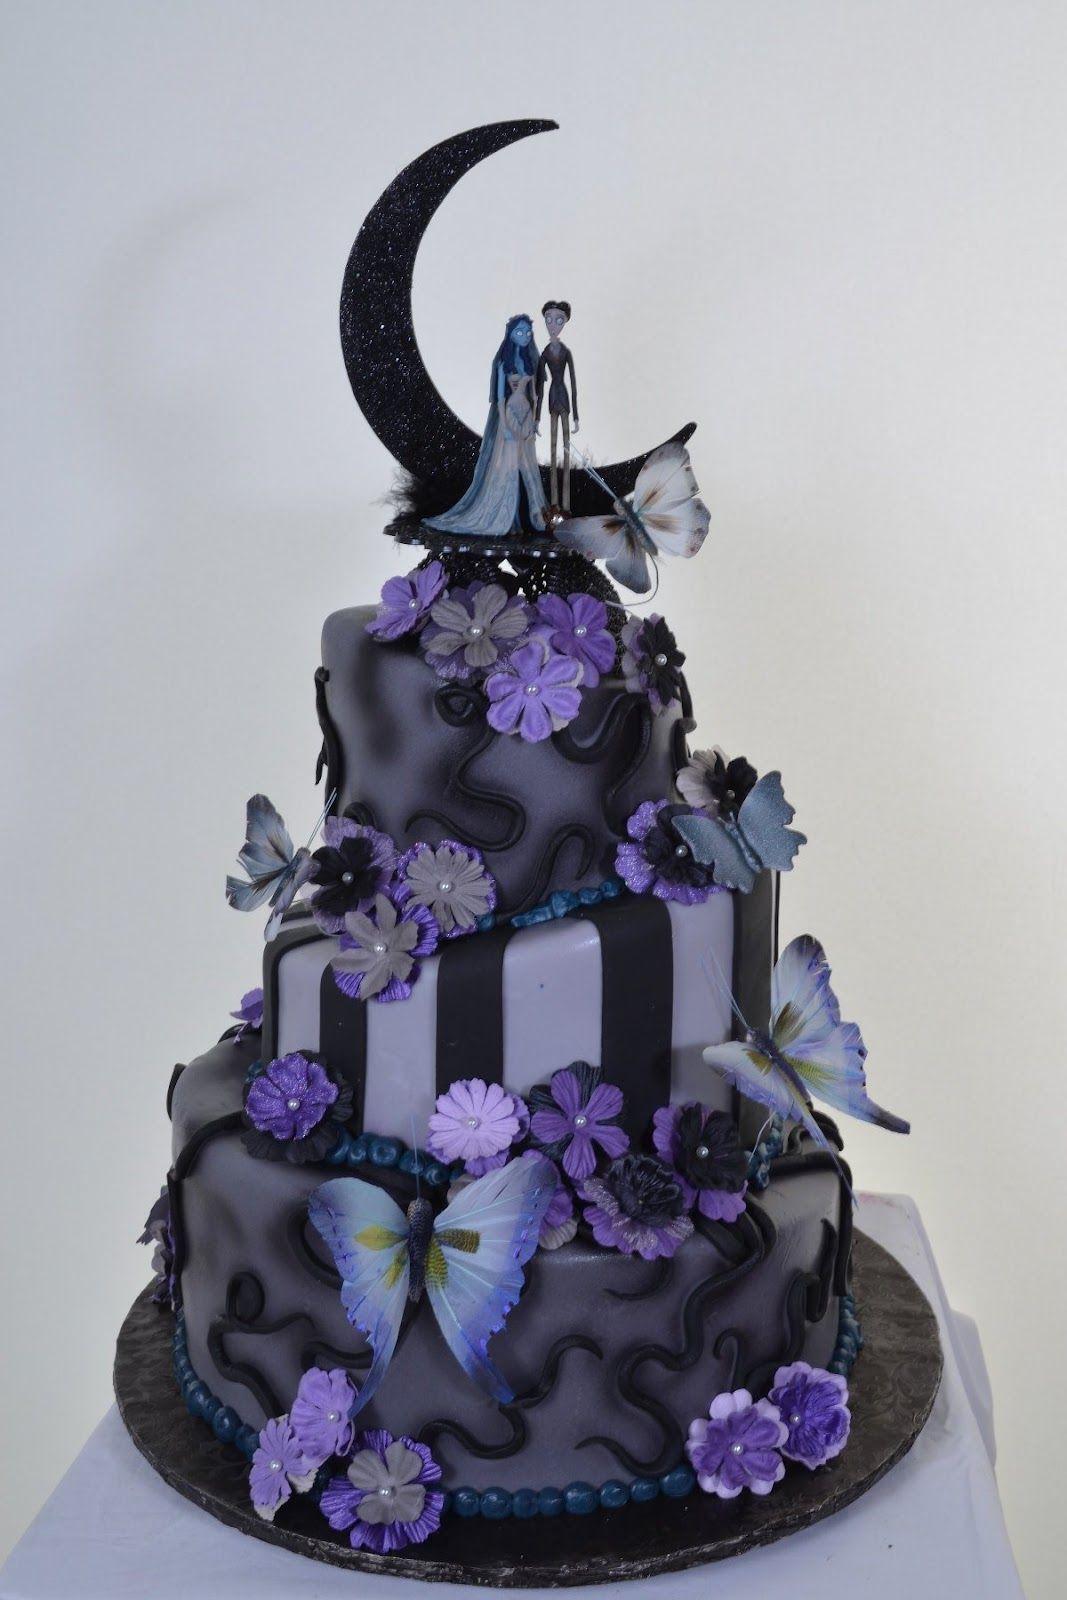 Nightmare Before Christmas Birthday Cakes | Nightmare Before ...